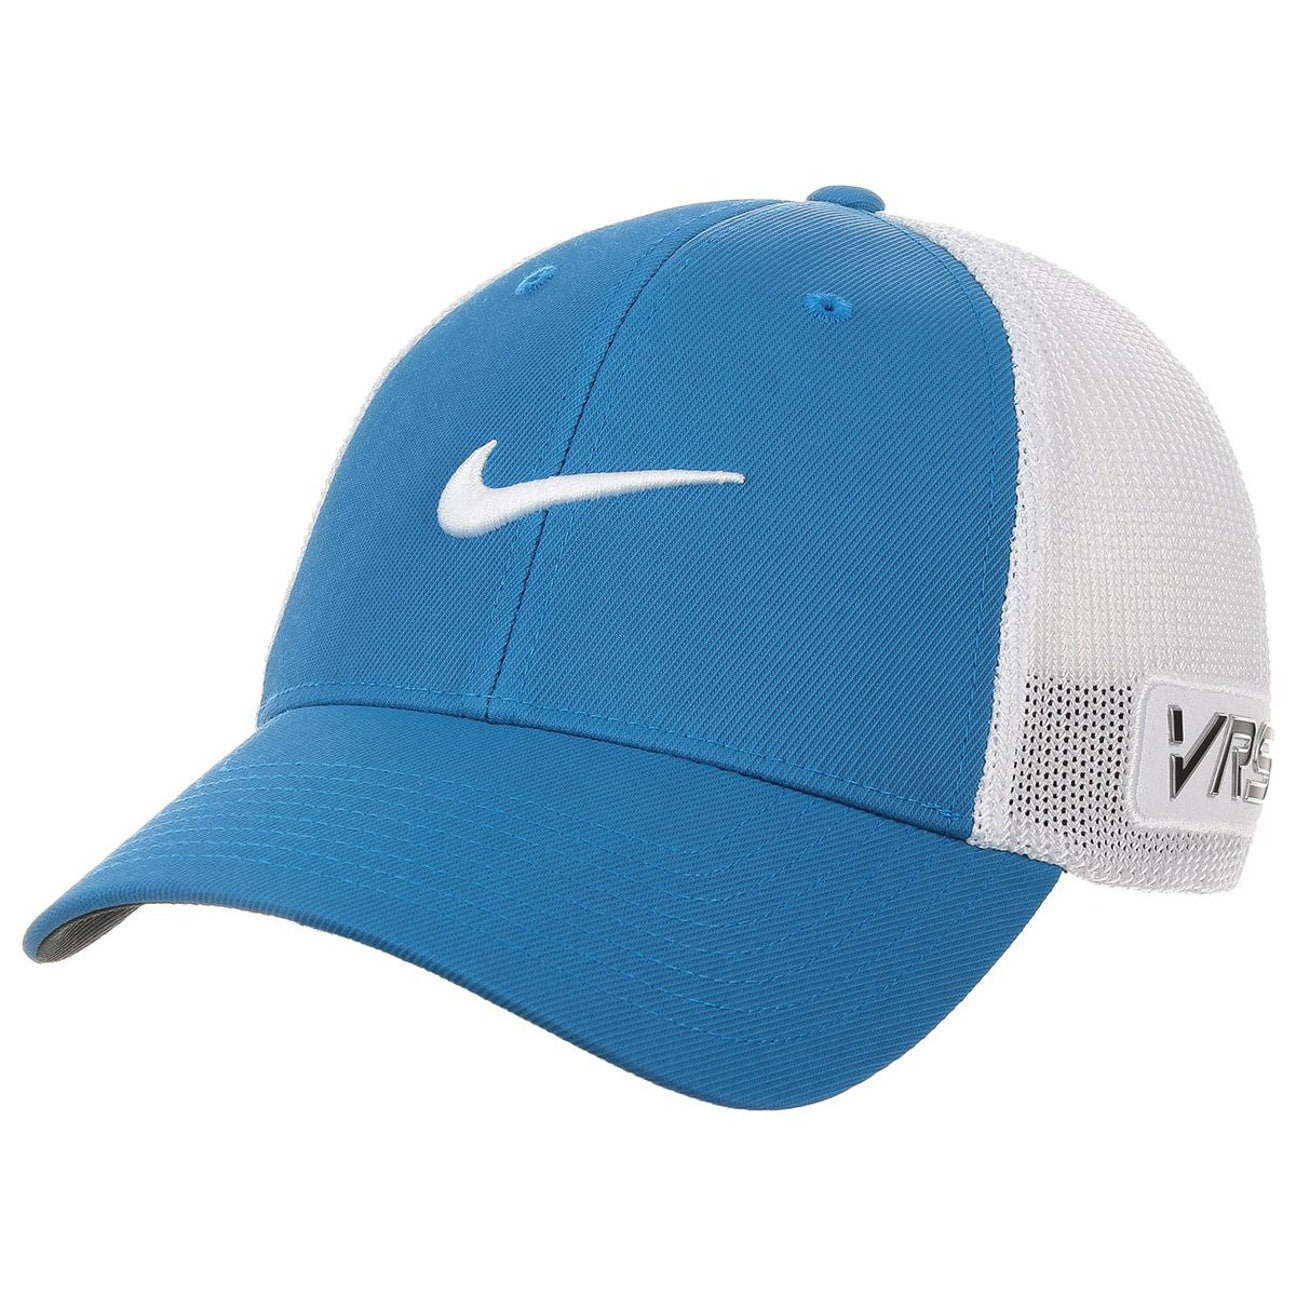 c60b8c90454f15 ... New Tour Flexfit Cap New Logo by Nike - light blue 1